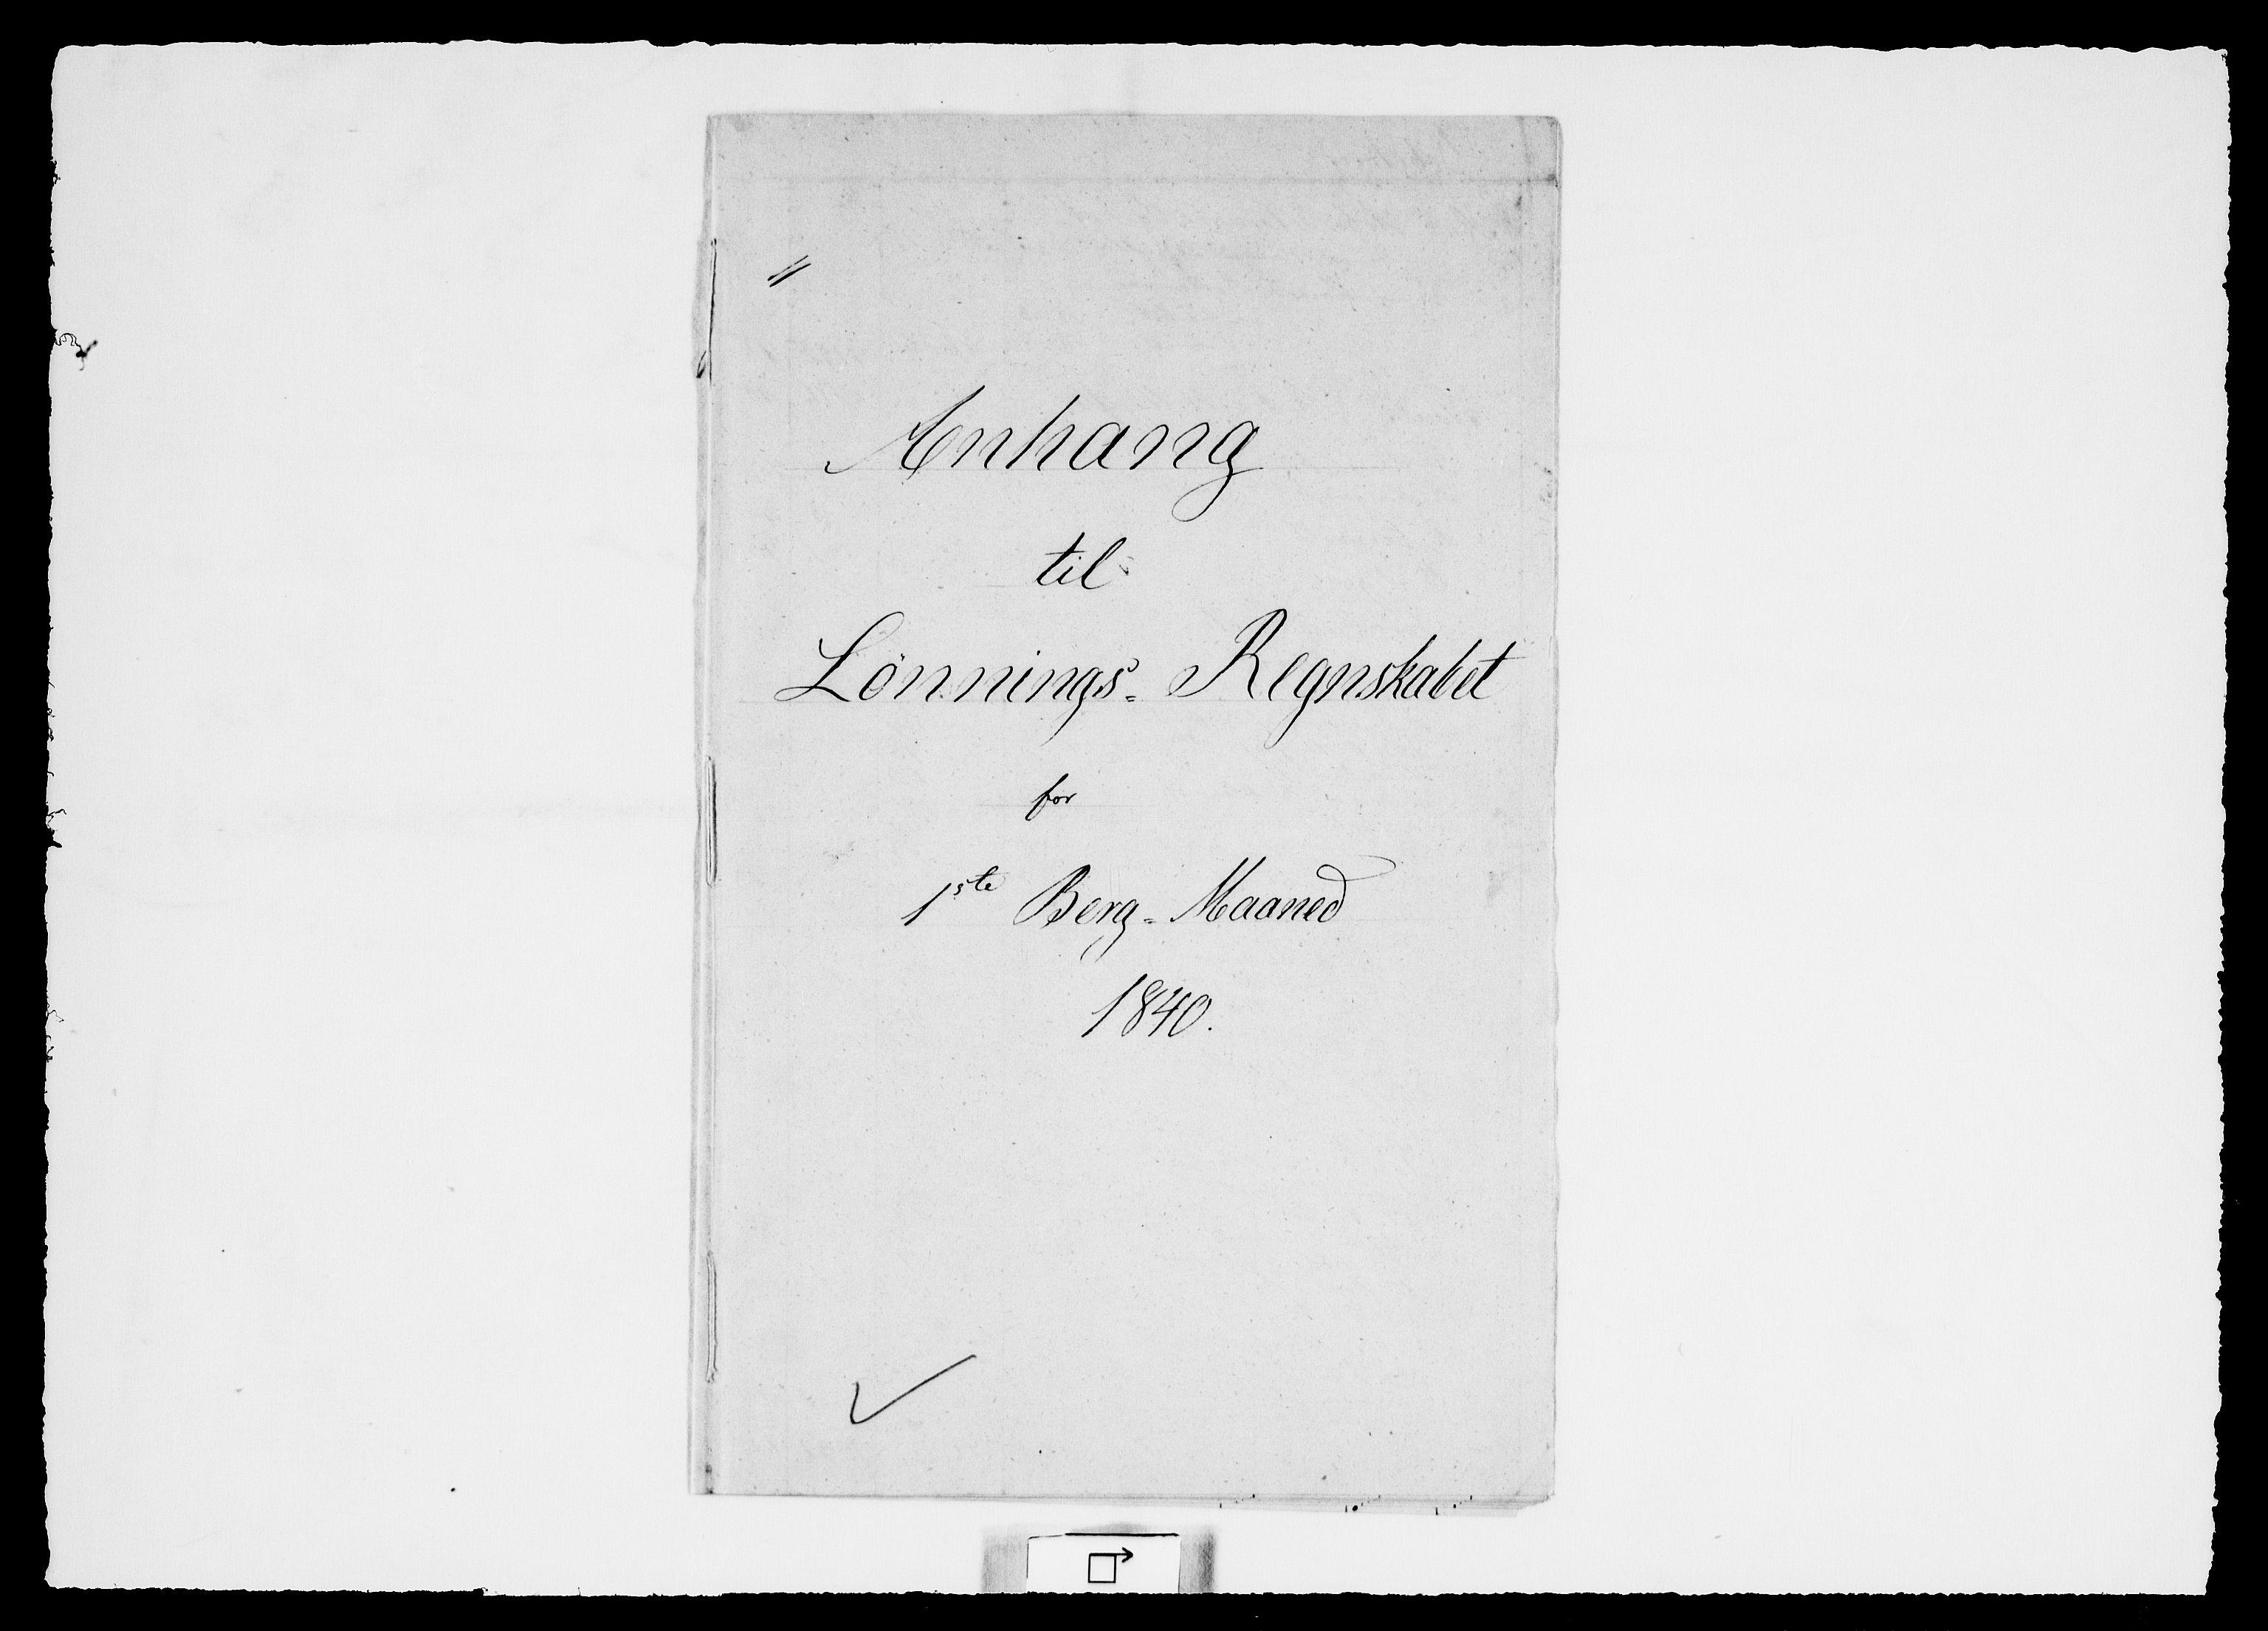 RA, Modums Blaafarveværk, G/Gd/Gdd/L0286, 1840-1849, s. 2